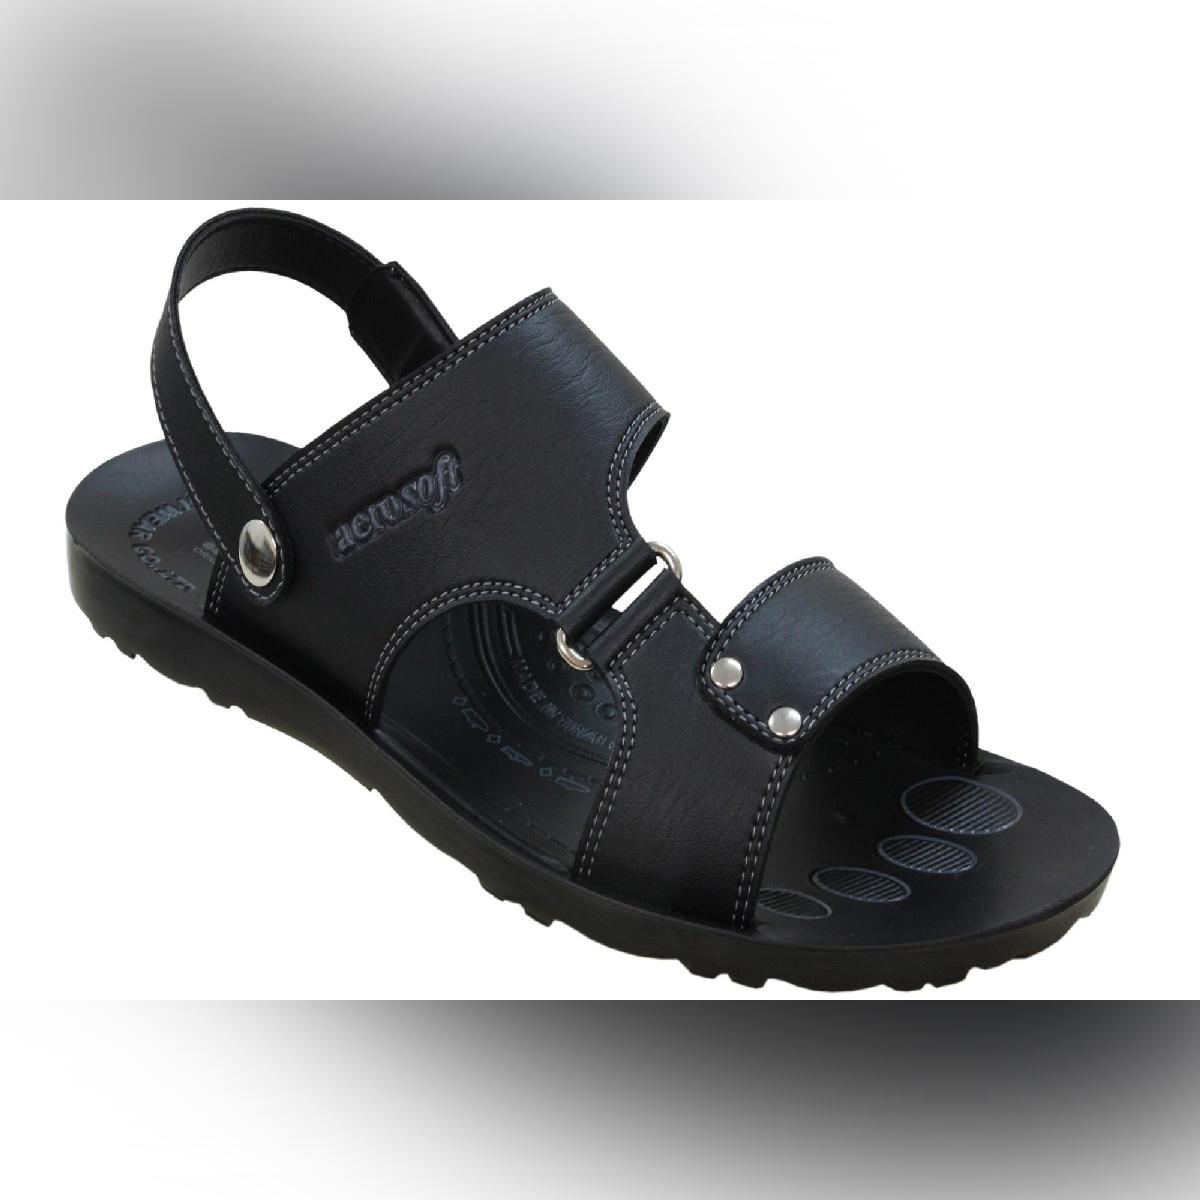 Aerosoft Black Synthetic Leather Sandals For Men P0111